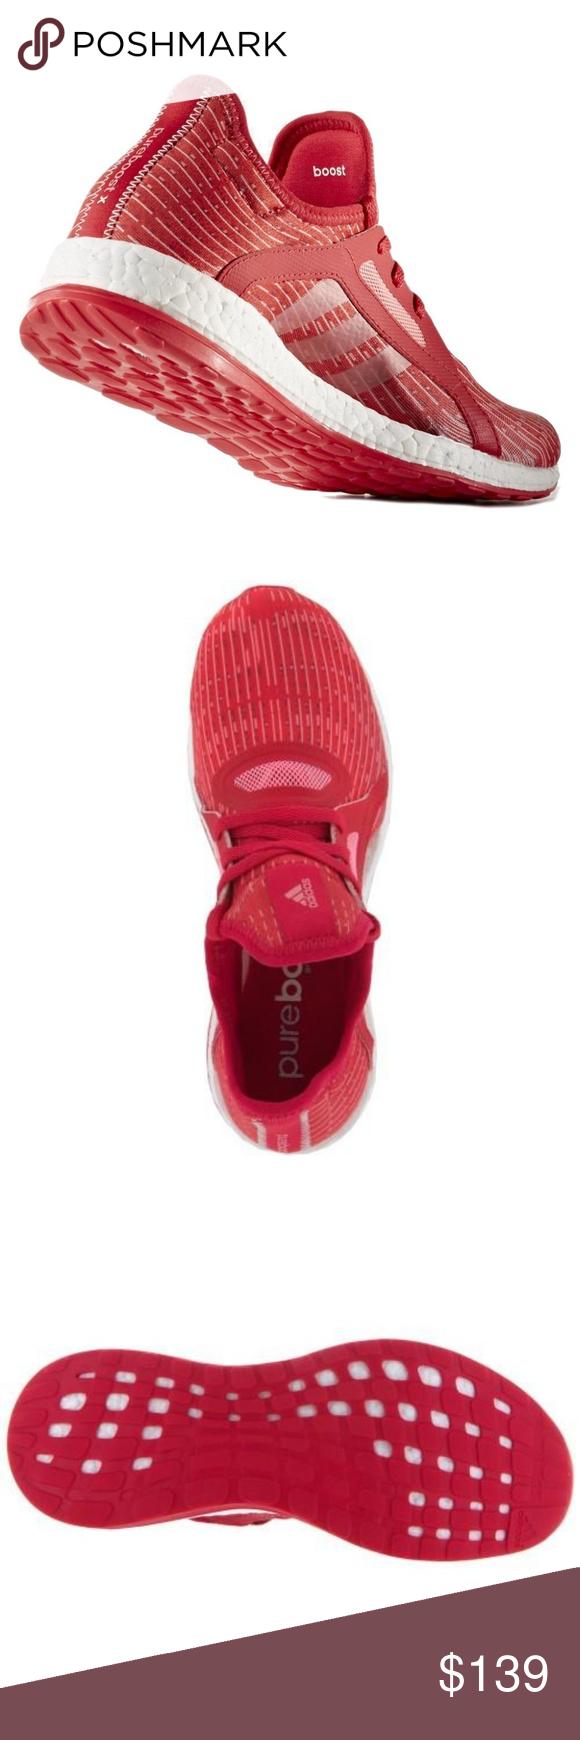 Adidas Women's Pure Boost X Running